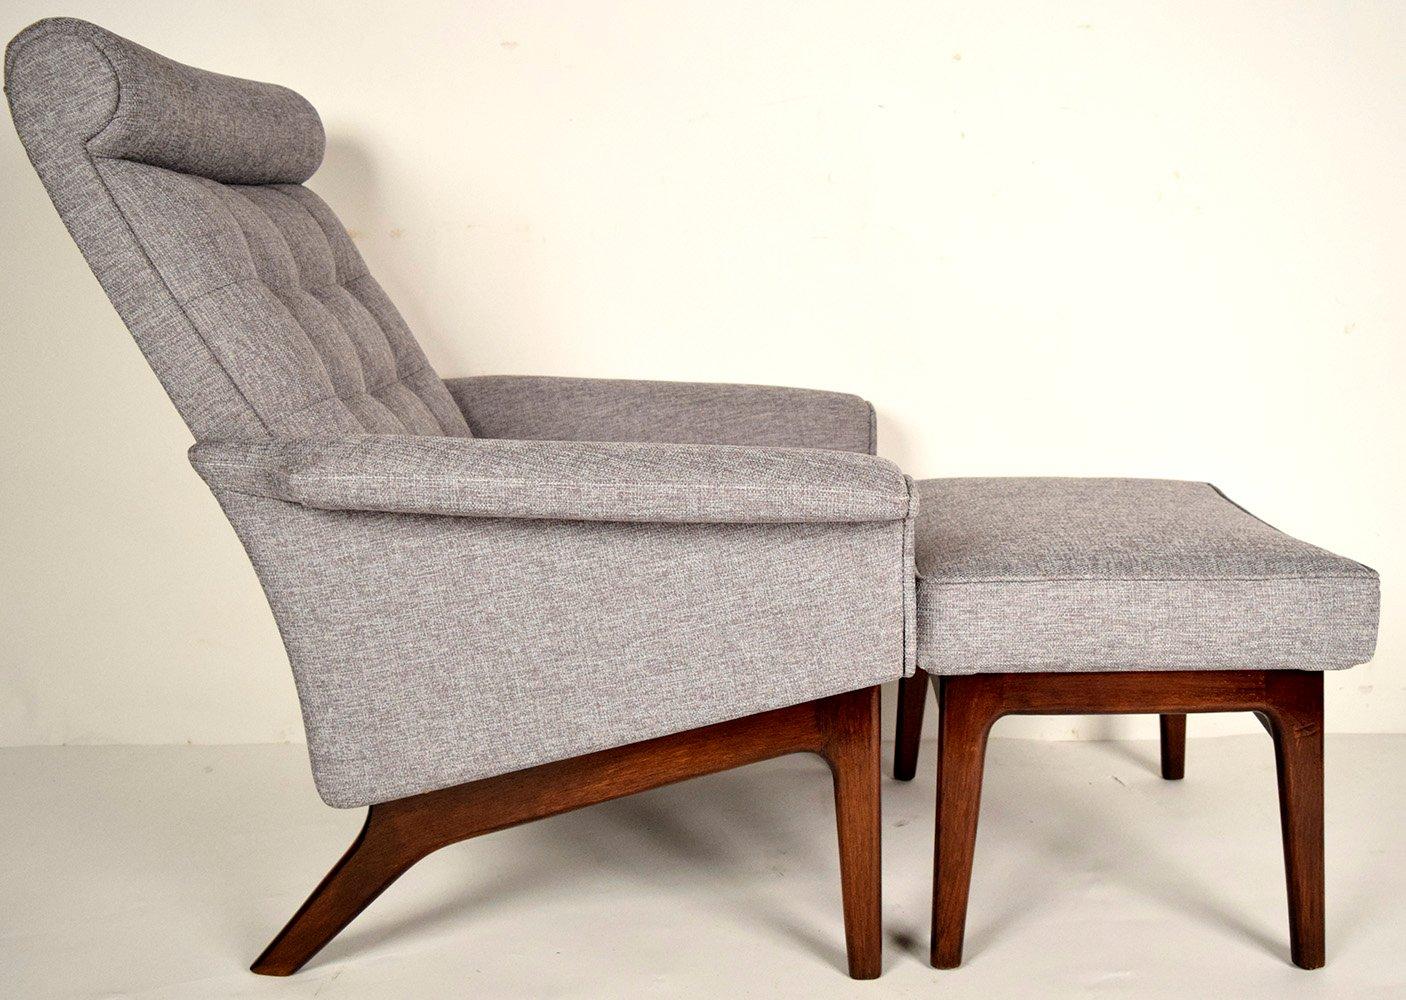 midcentury danish lounge chair  ottoman by poul jensen. midcentury danish lounge chair  ottoman by poul jensen for sale